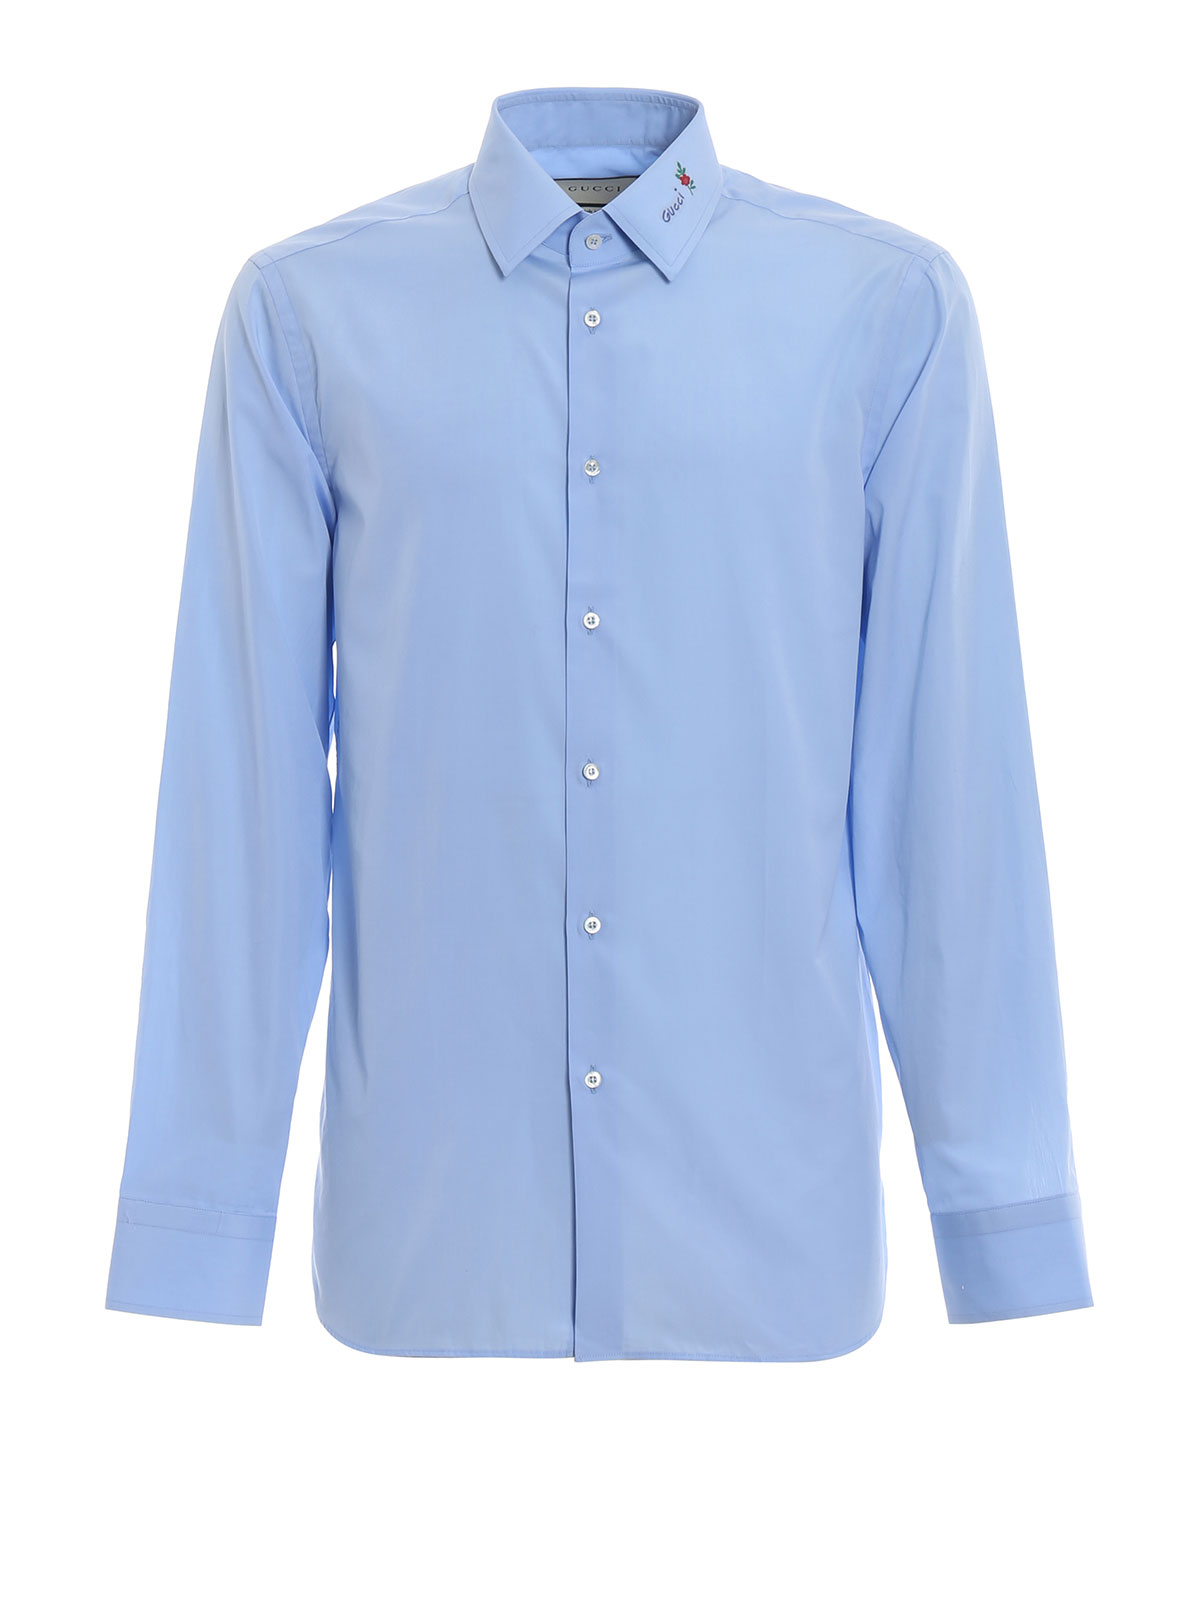 6a3a329e Gucci - Gucci embroidery light blue fil coupé shirt - shirts ...